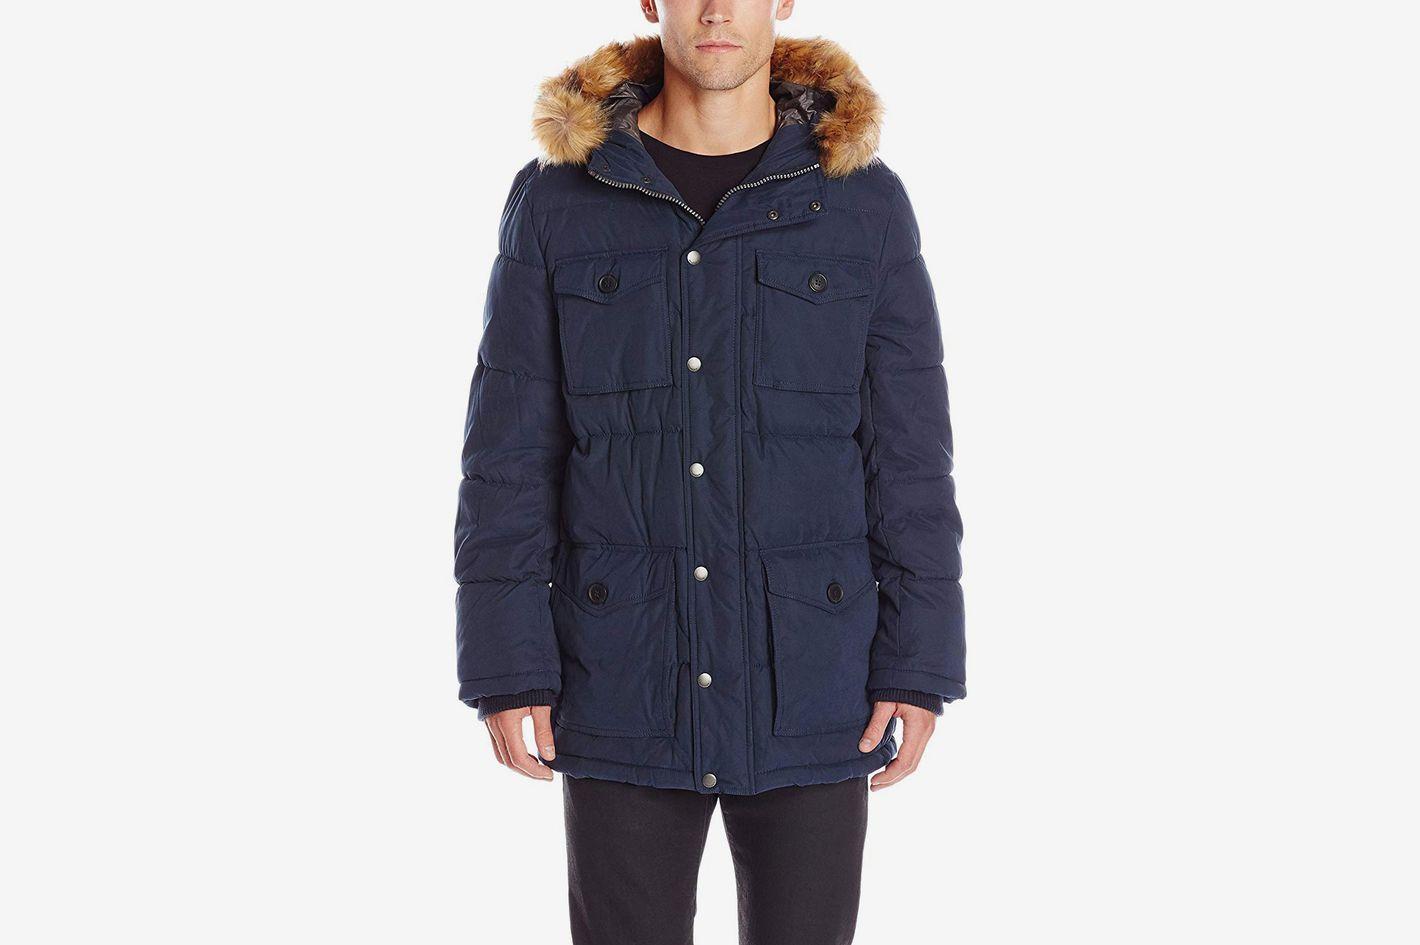 Tommy Hilfiger Men's Micro Twill Parka Coat